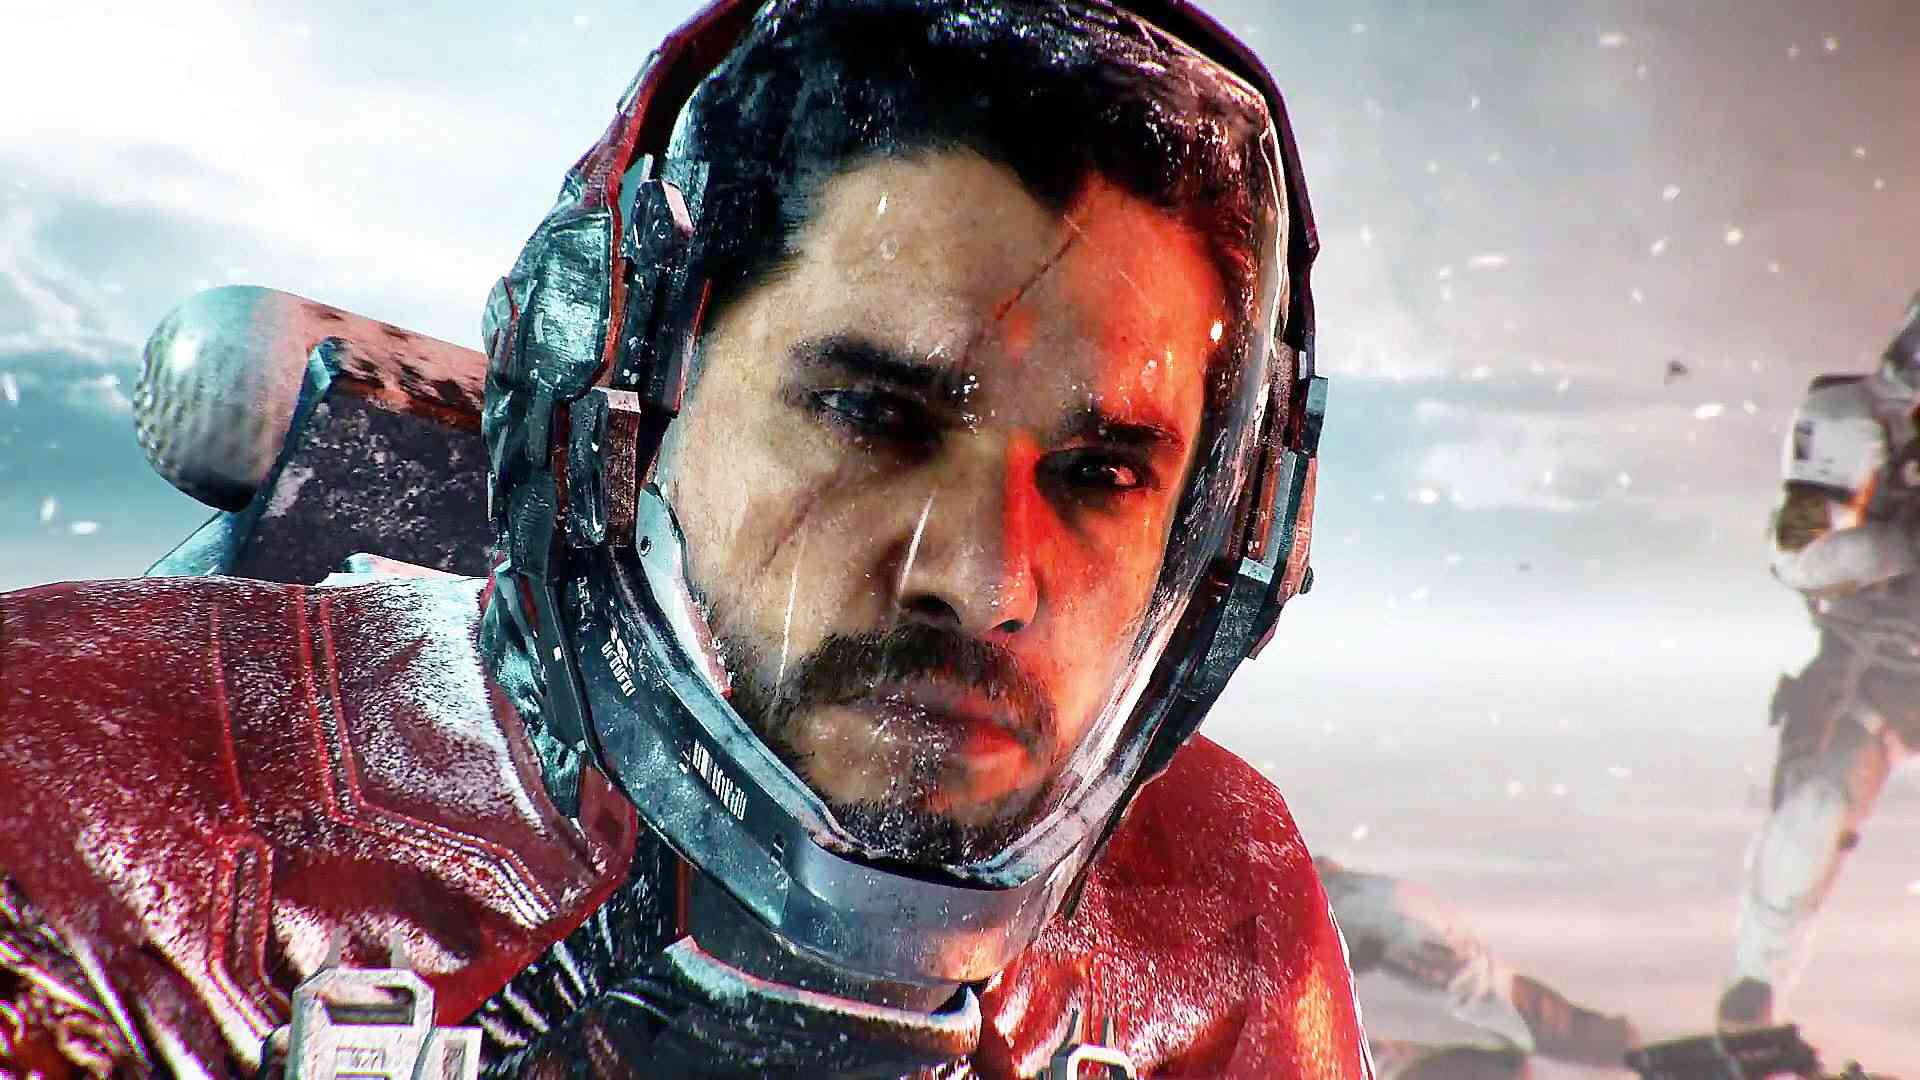 Call of Duty: Infinite Warfare Video Review - Infinity Ward's Best Yet